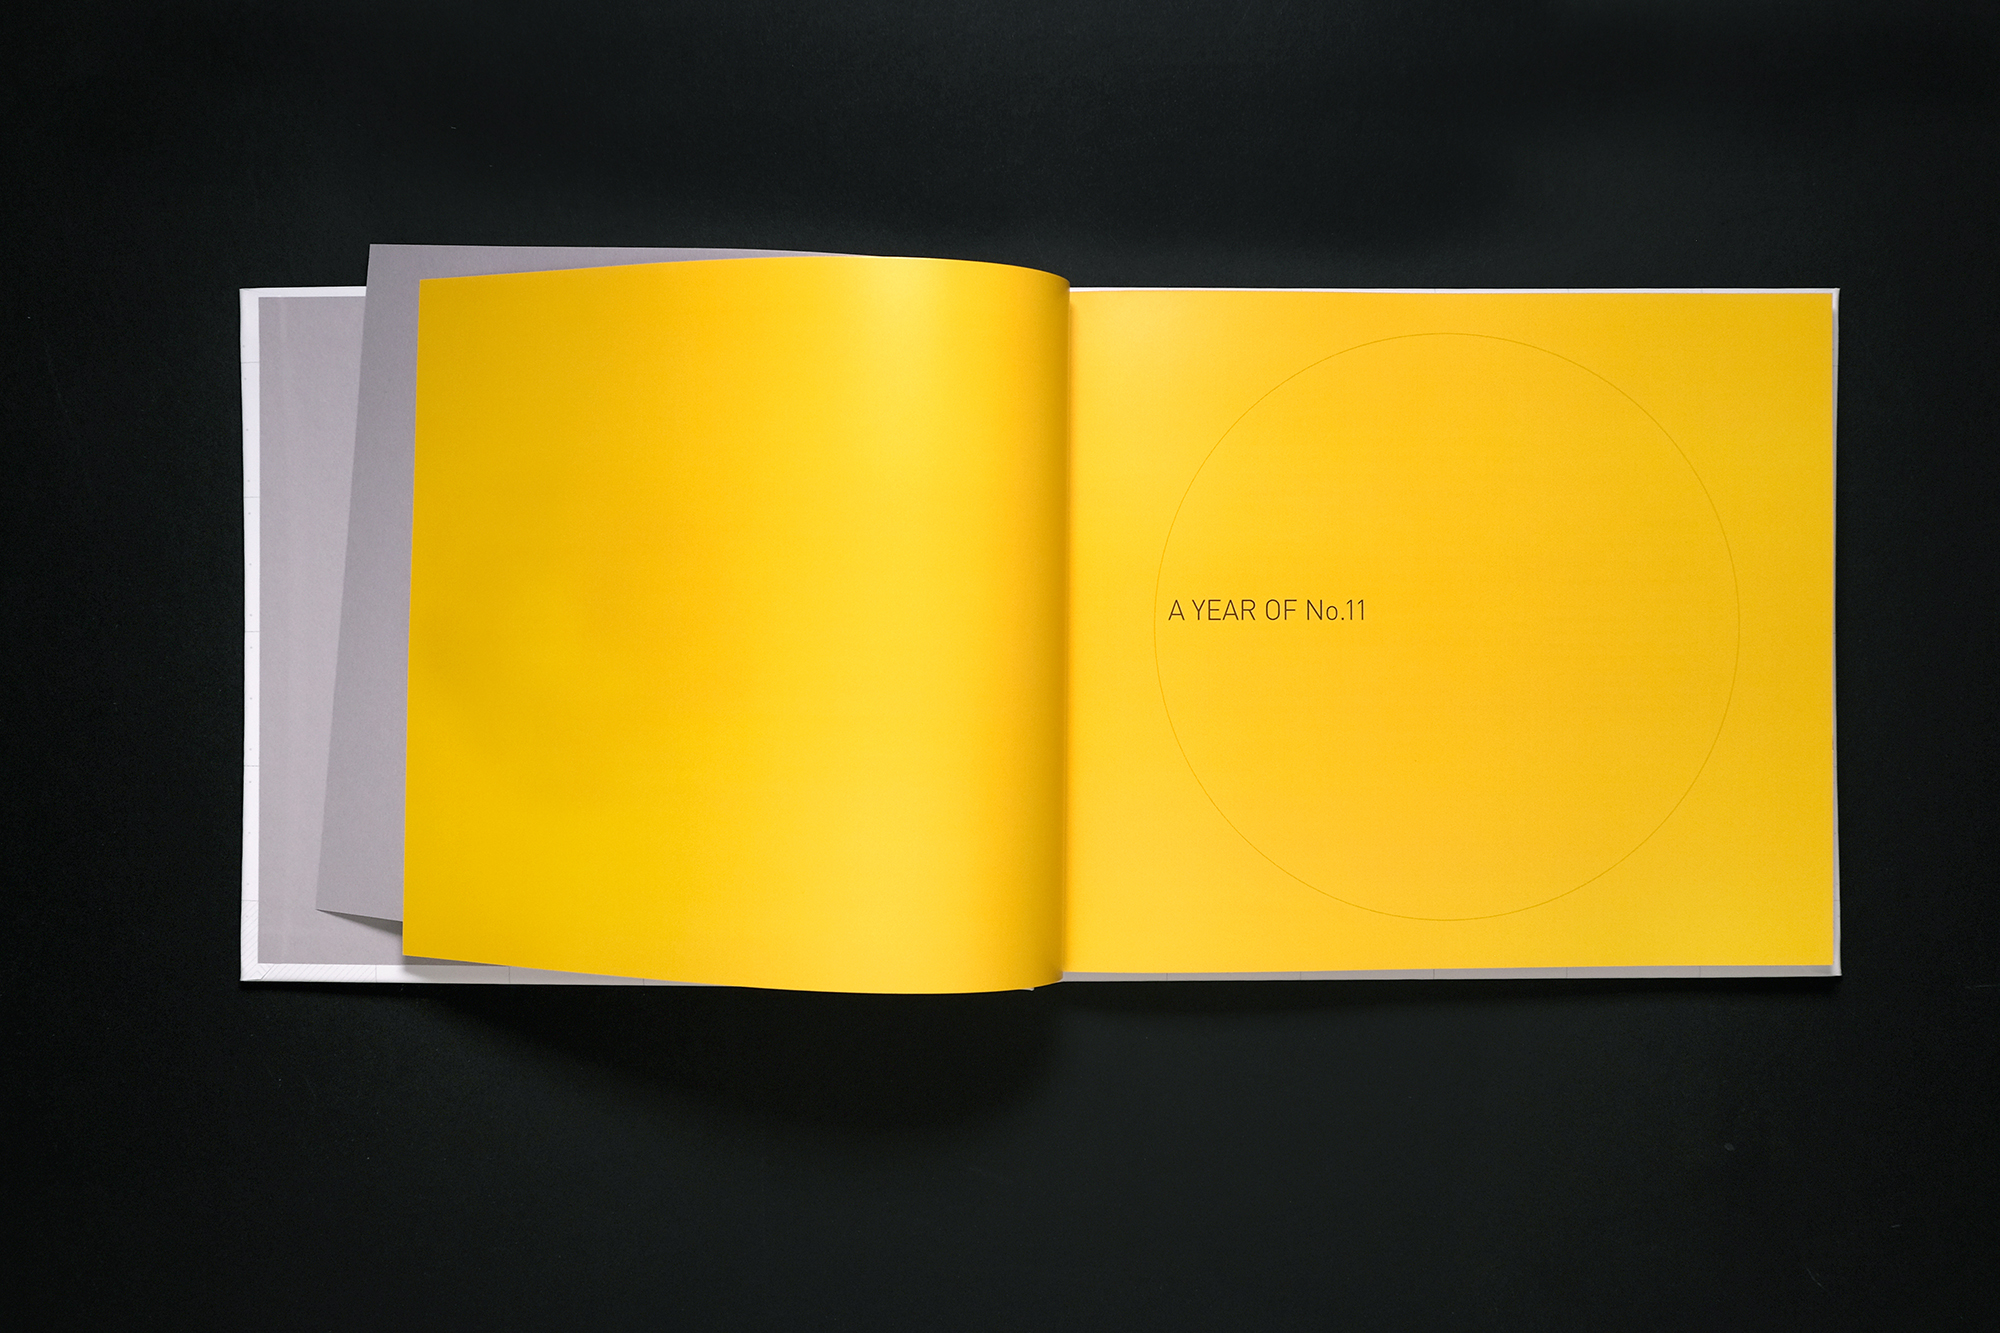 http://rusyndesign.co.uk/wp-content/uploads/2020/04/UWR-19-book-shots-03.jpg